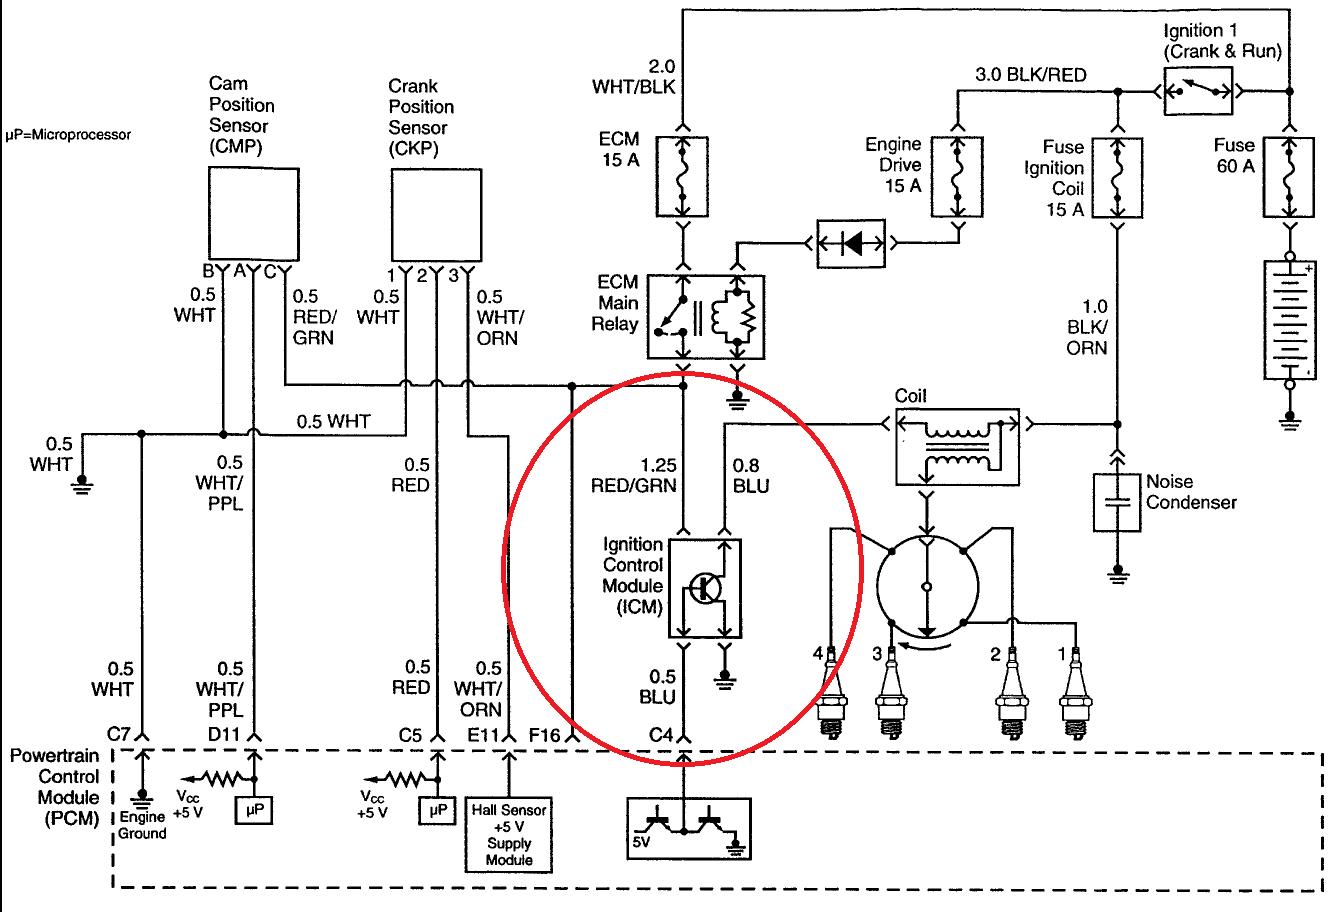 Wiring Schematic For 1997 Isuzu Trooper Wiring Diagrams District Manage A District Manage A Alcuoredeldiabete It